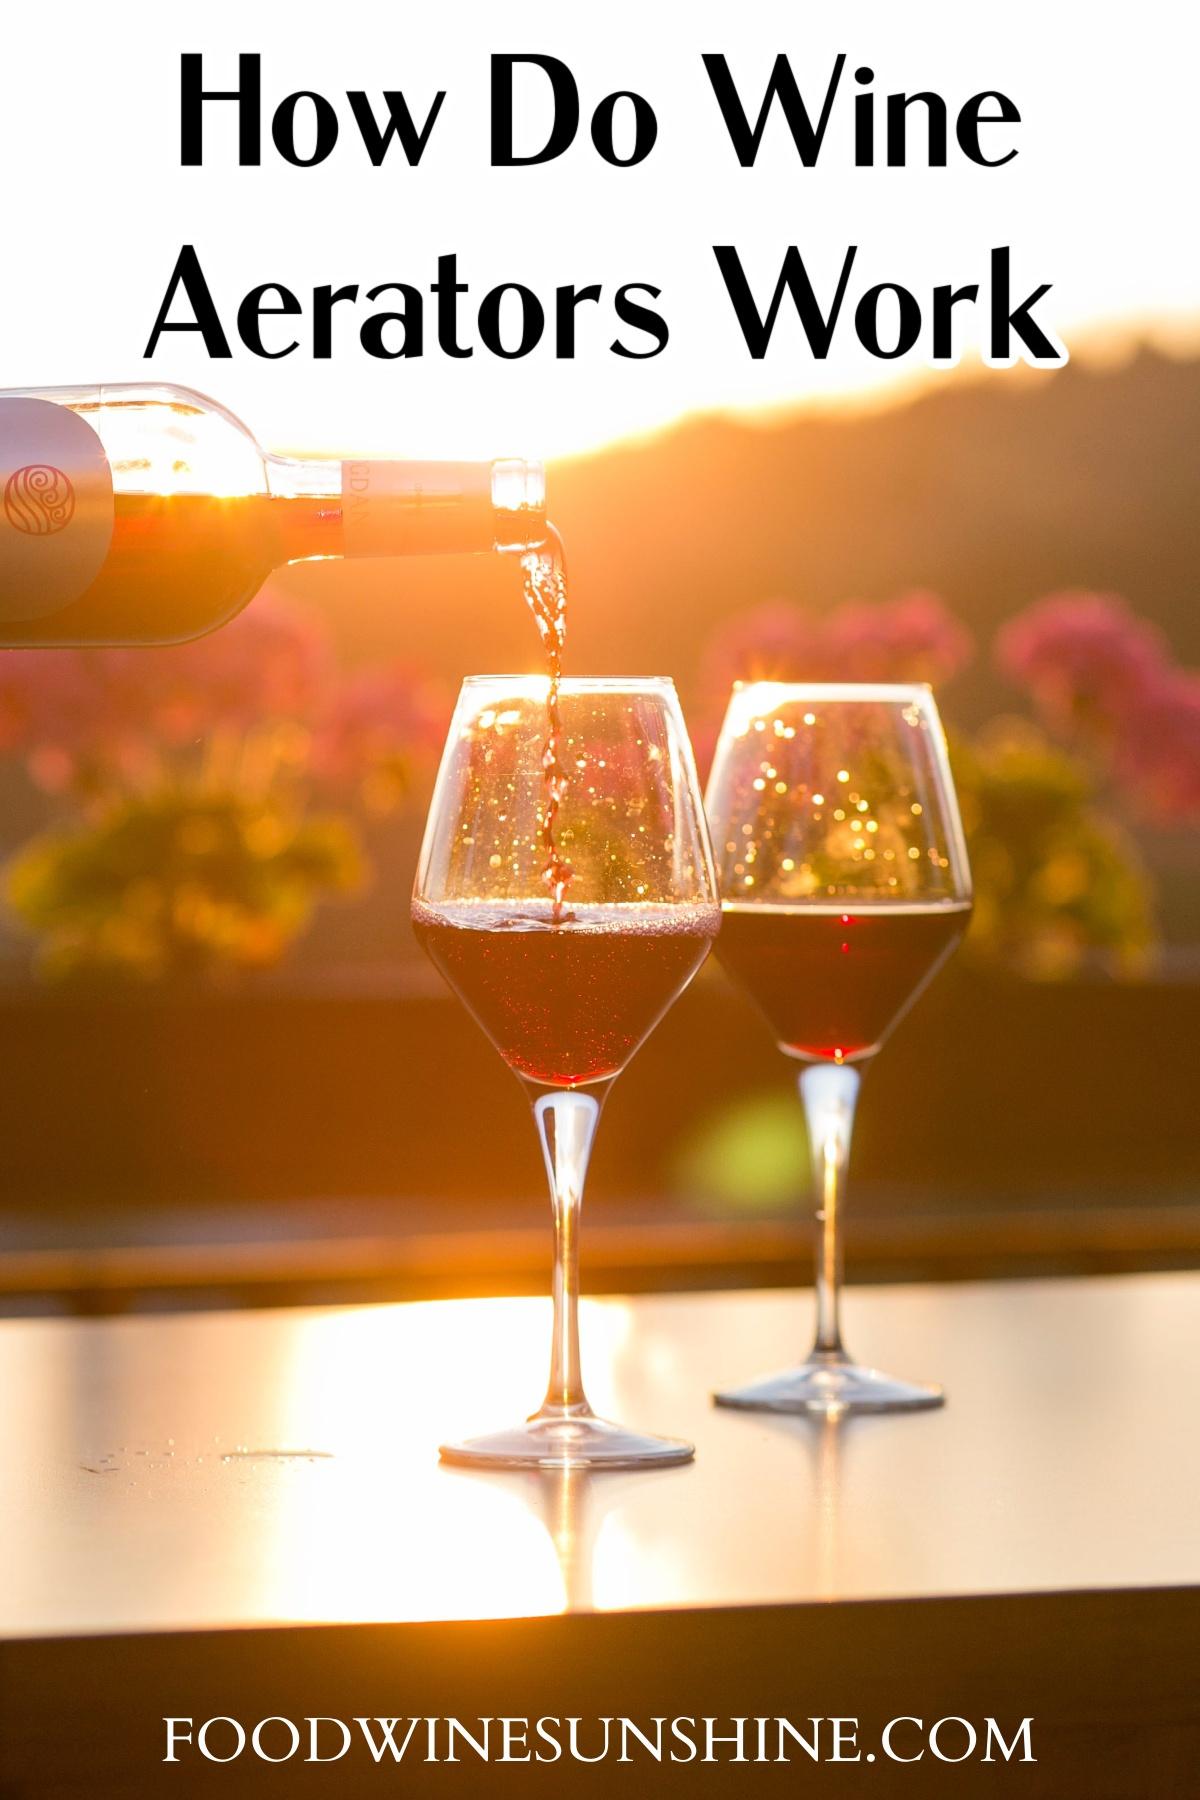 How Do Wine Aerators Work